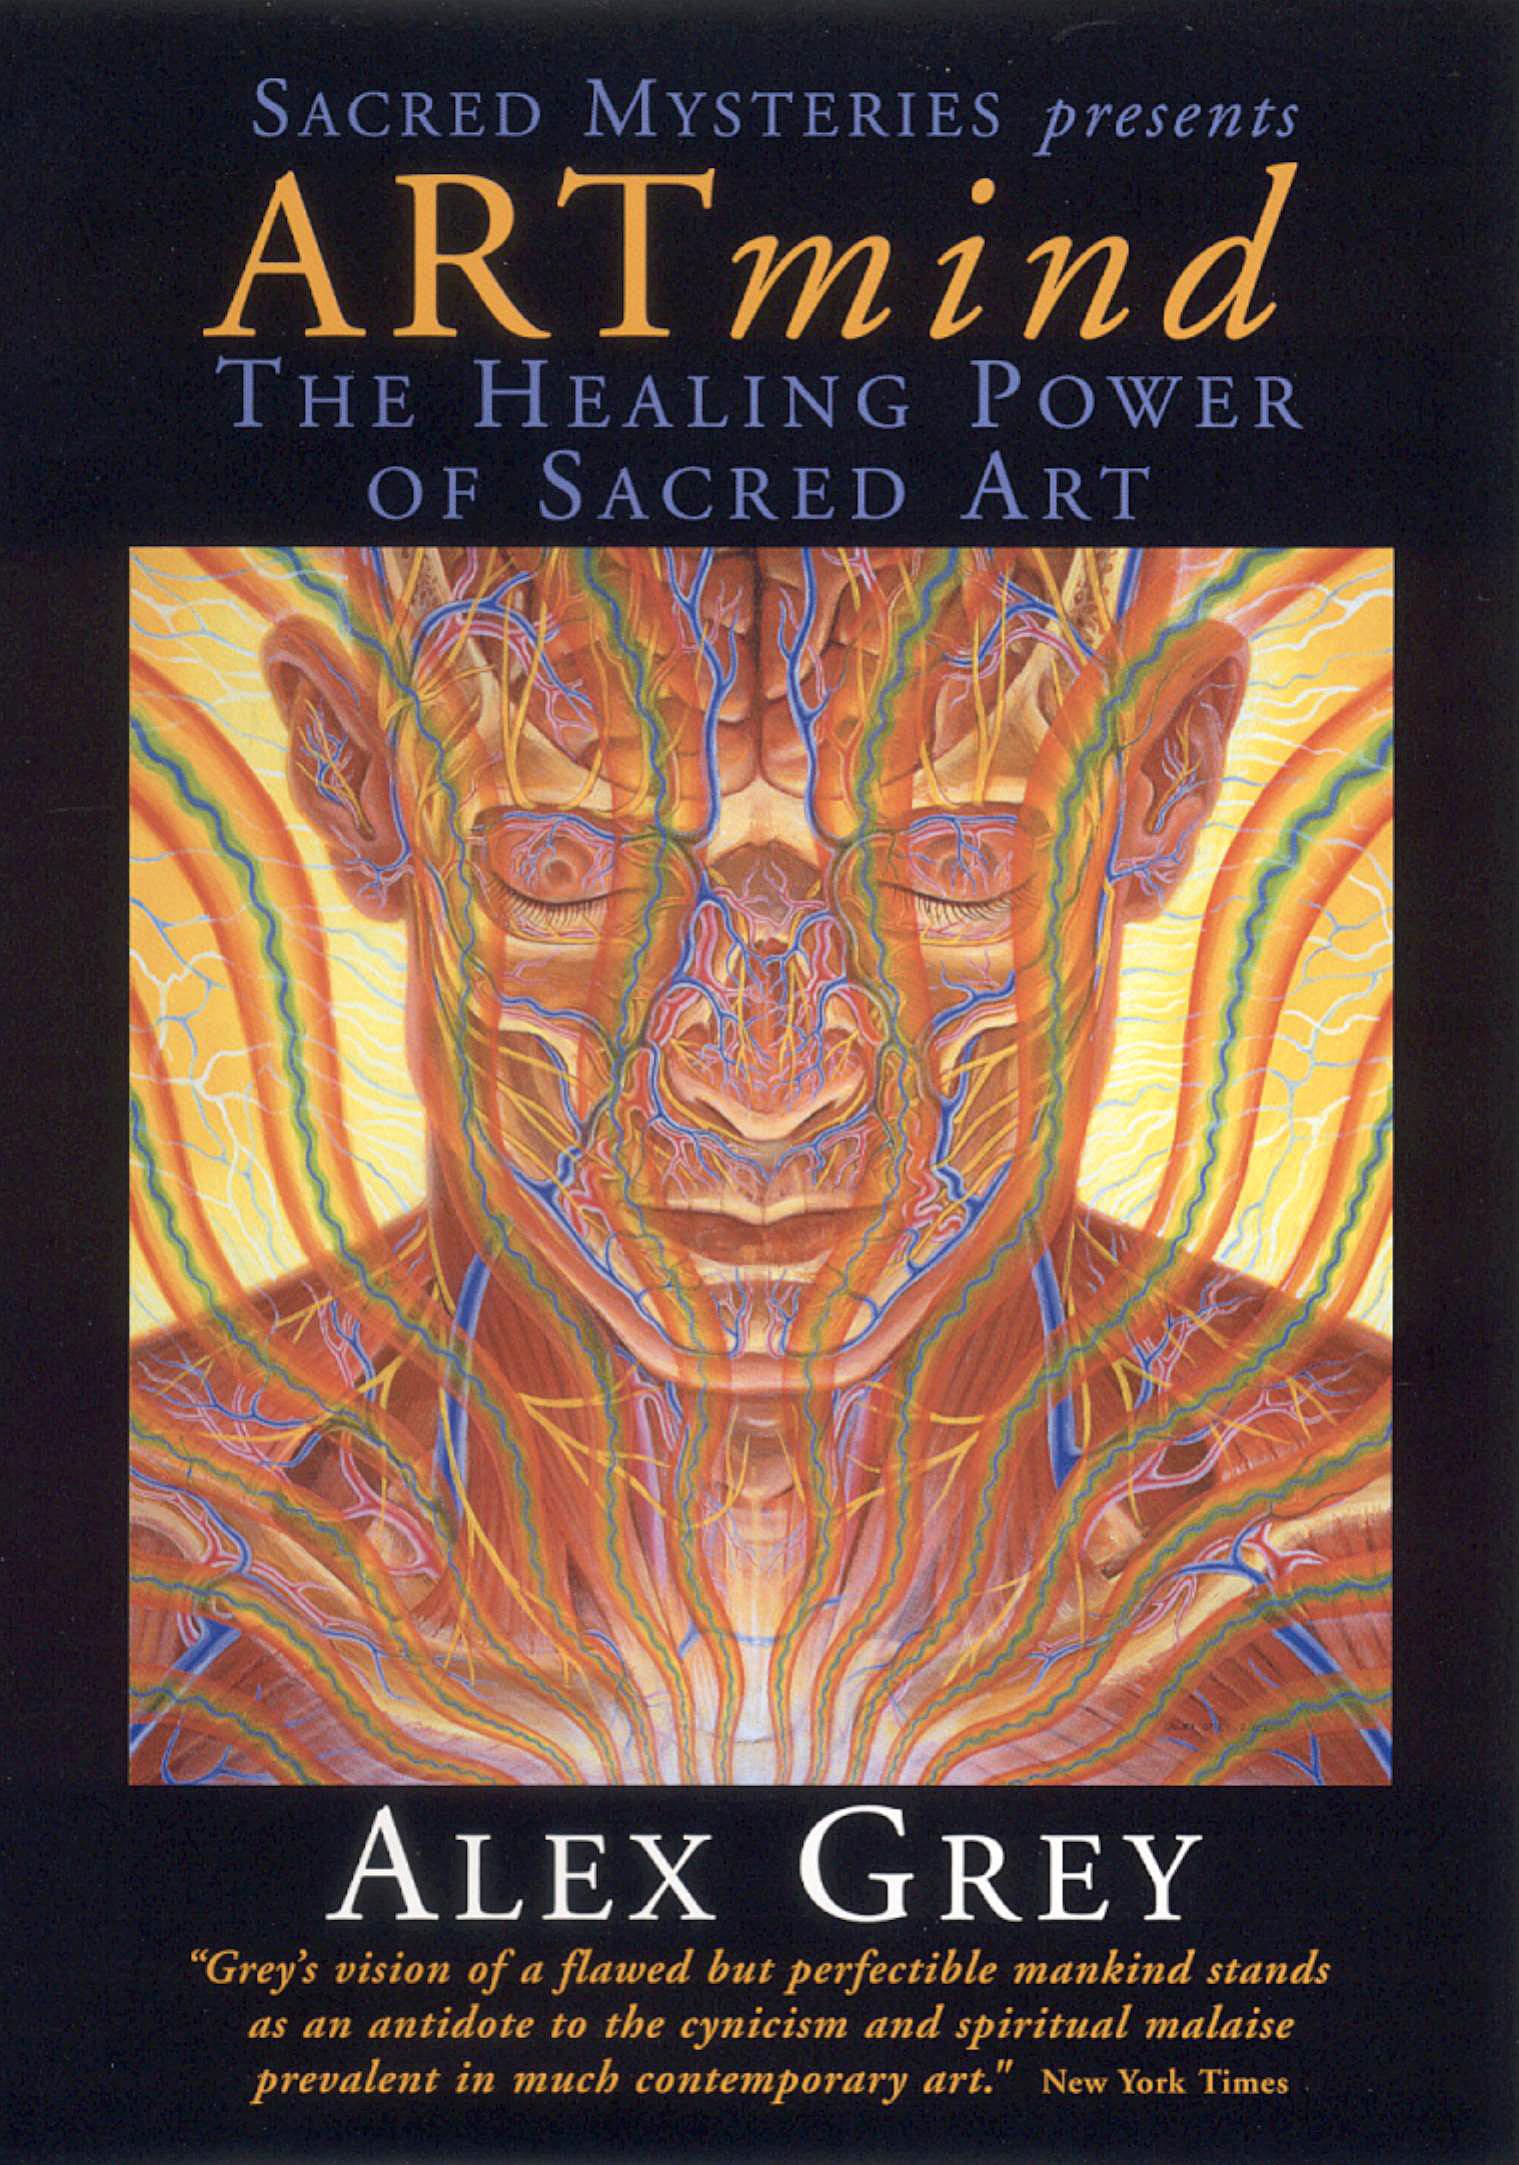 ARTmind: The Healing Power of Sacred Art